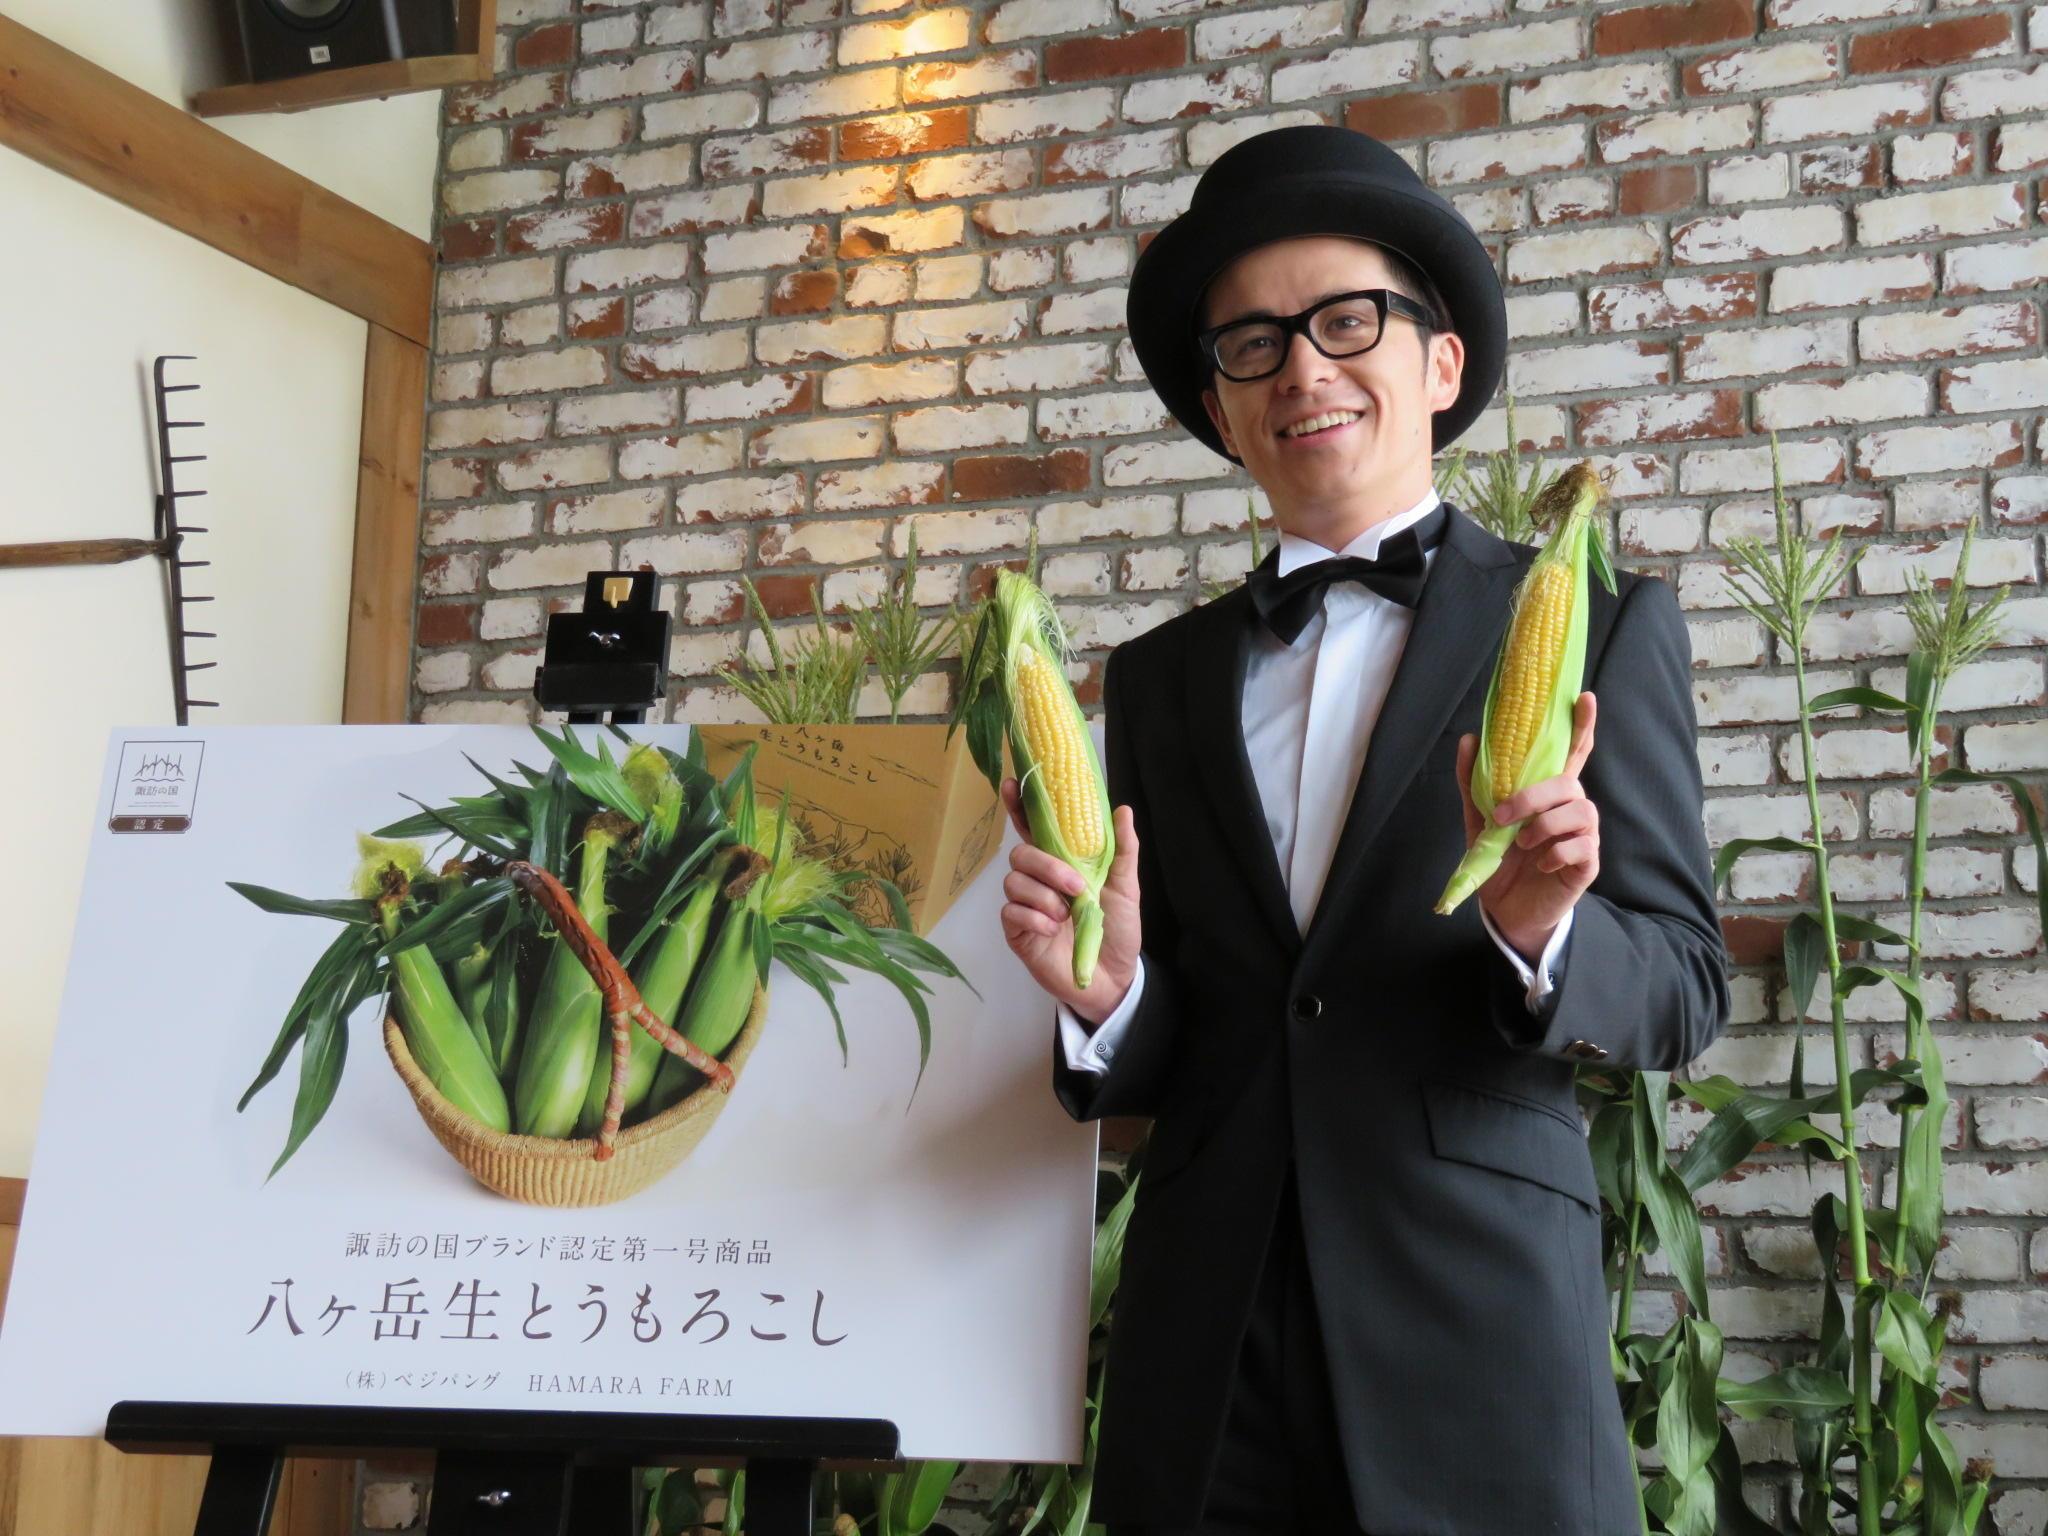 http://news.yoshimoto.co.jp/20180731173510-b7cd30f887836c8d7a50e48ae0243e9a966f83c1.jpg